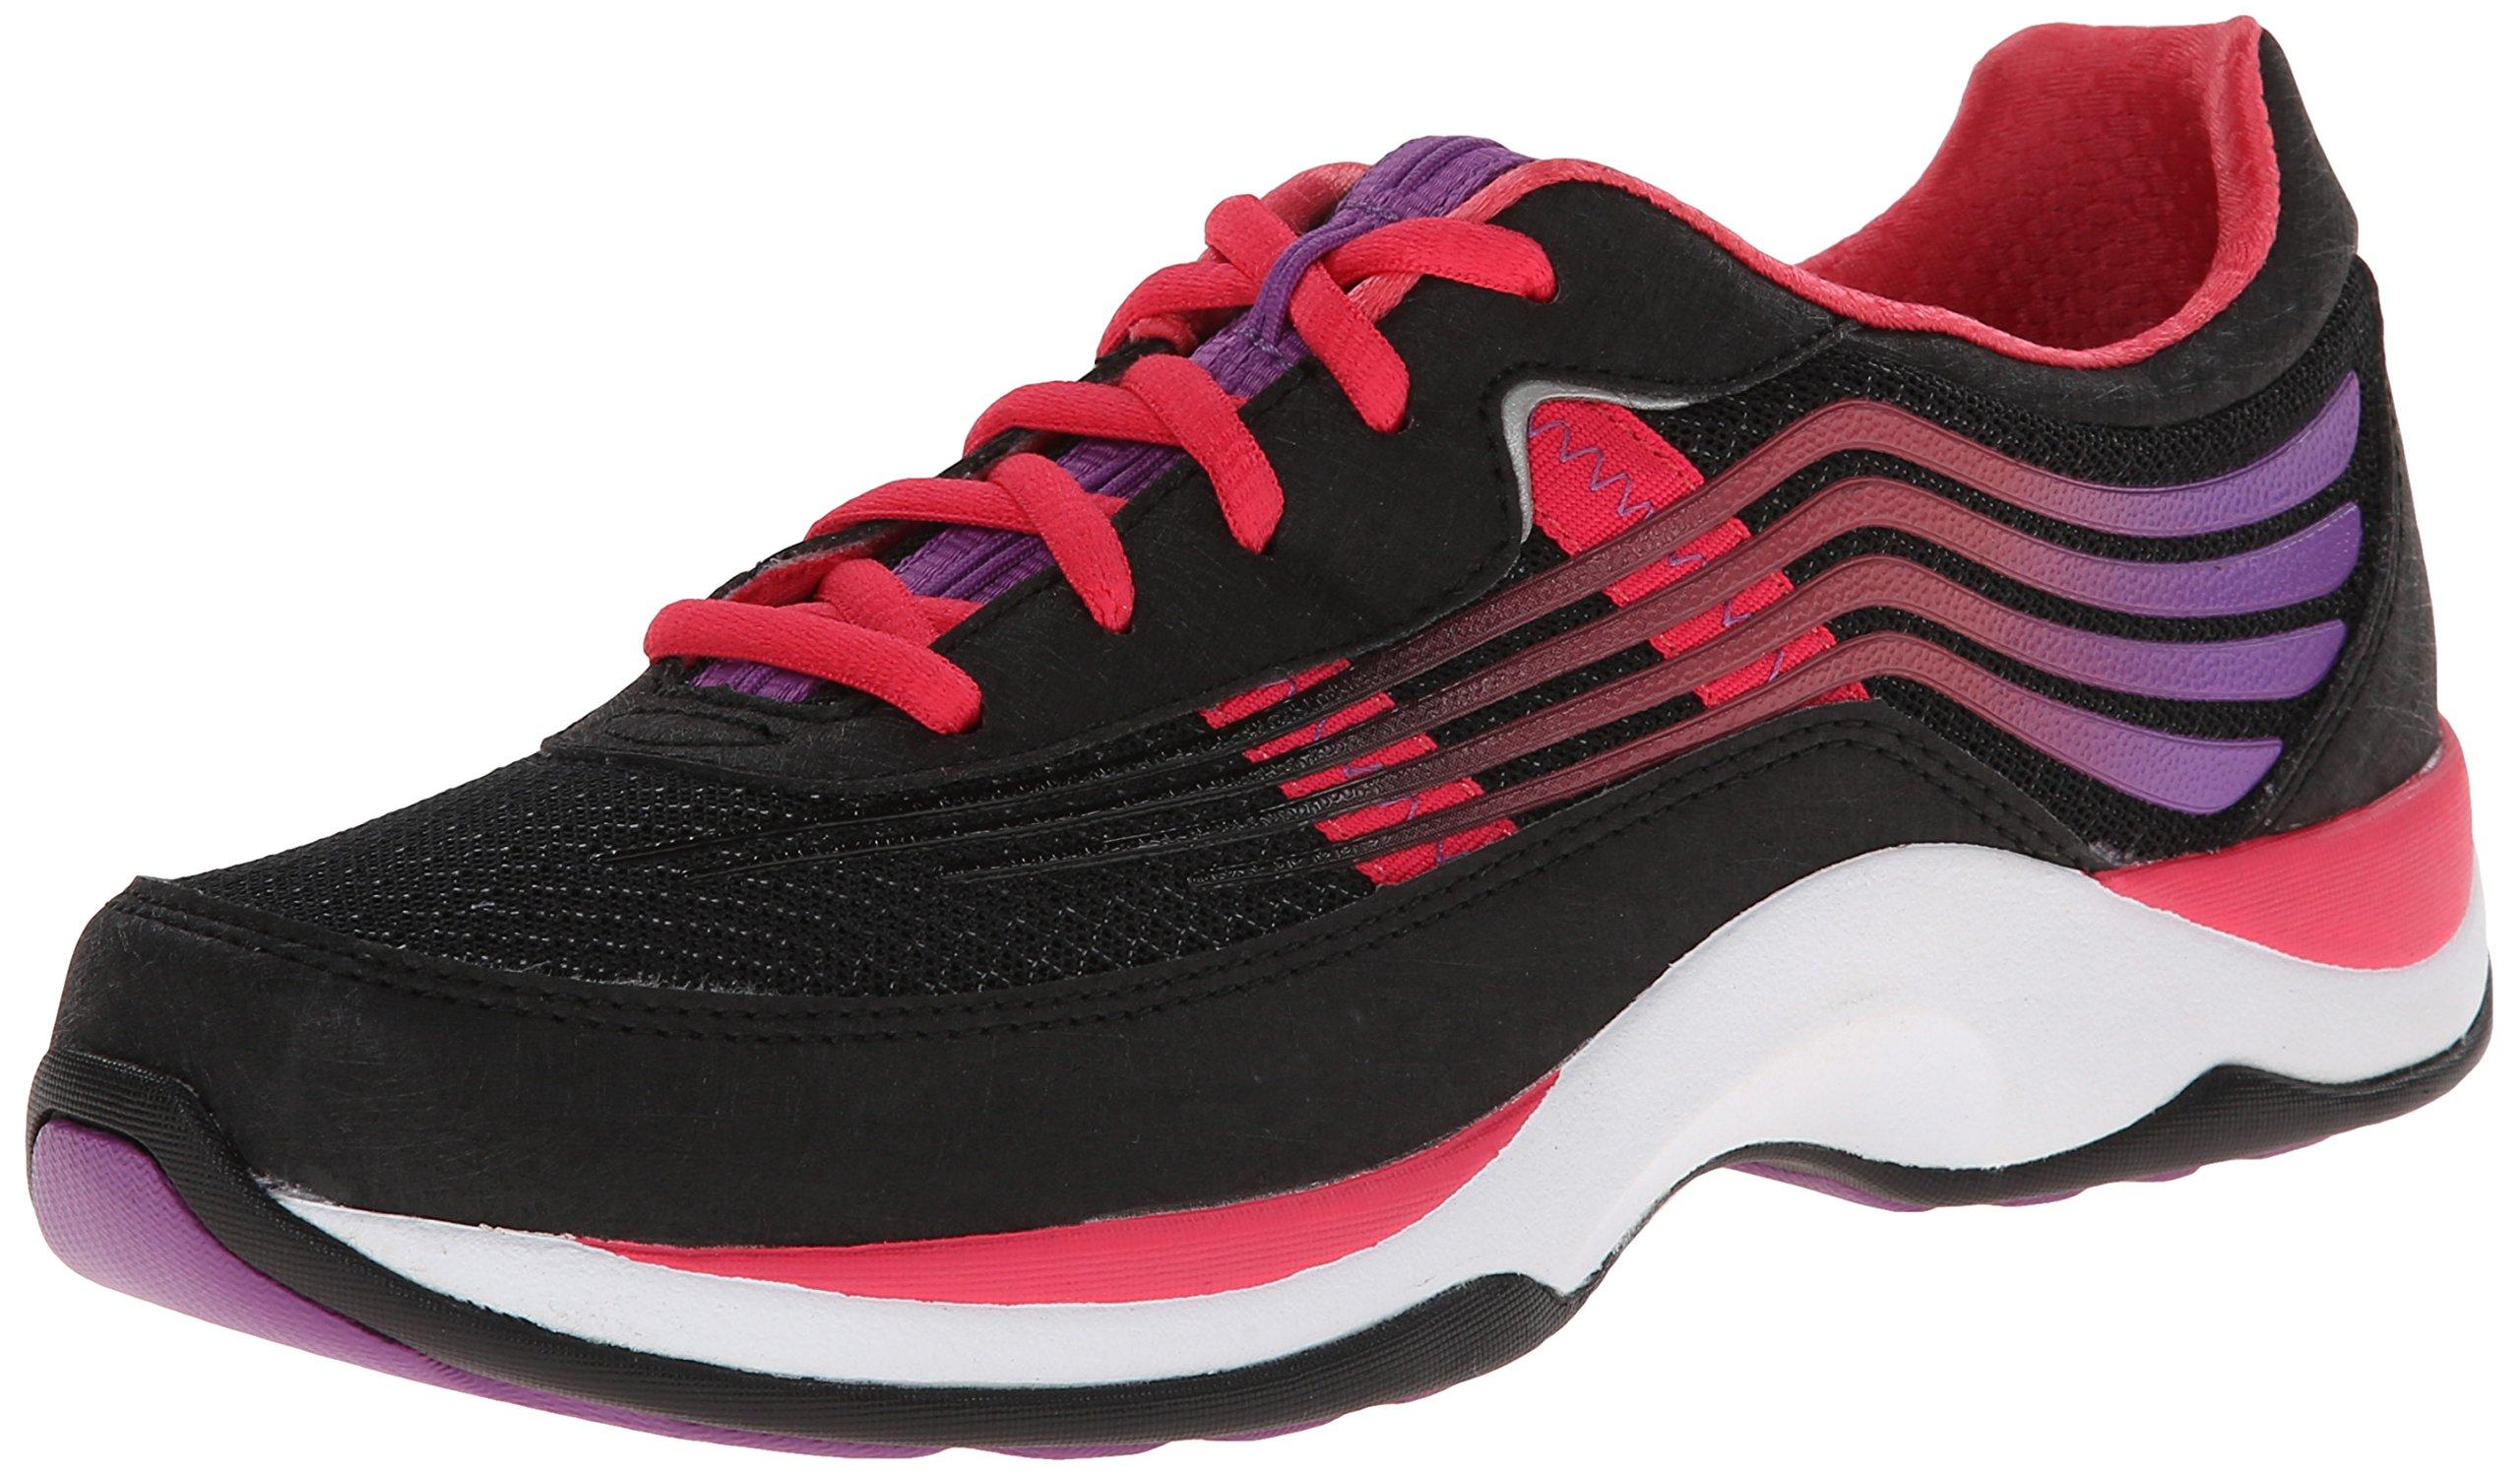 Dansko Women's Shayla Fashion Sneaker, Black/Hot Pink Smooth, 36 EU/5.5-6 M US